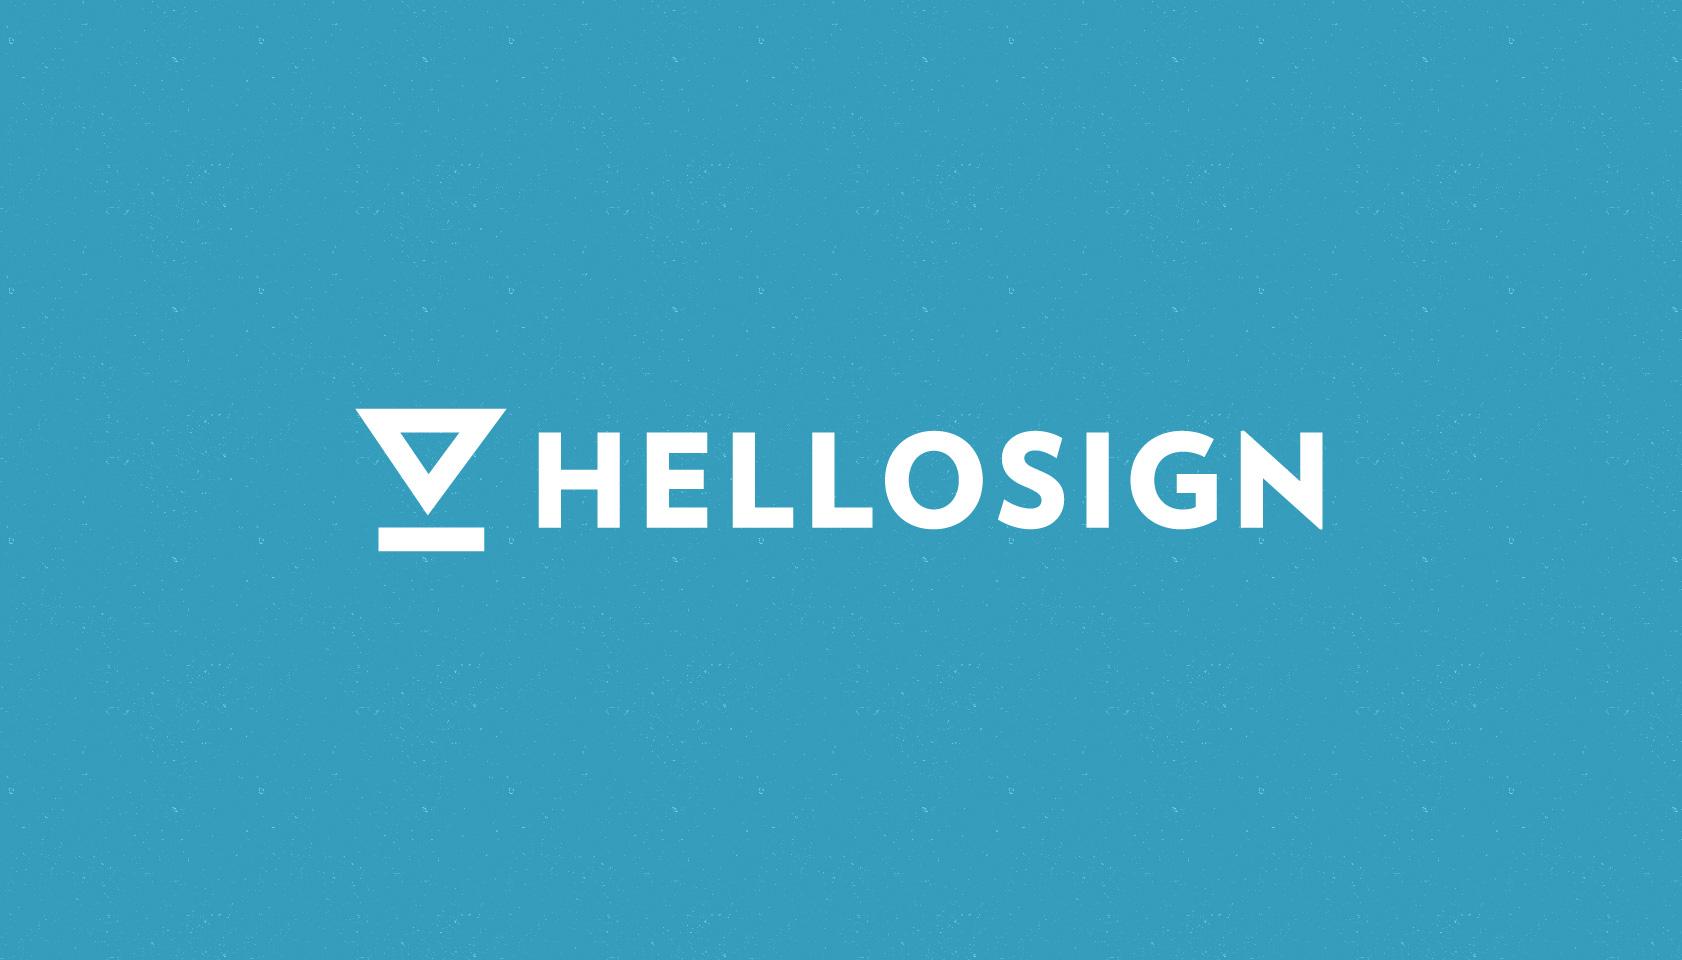 hellosign-plus-overture